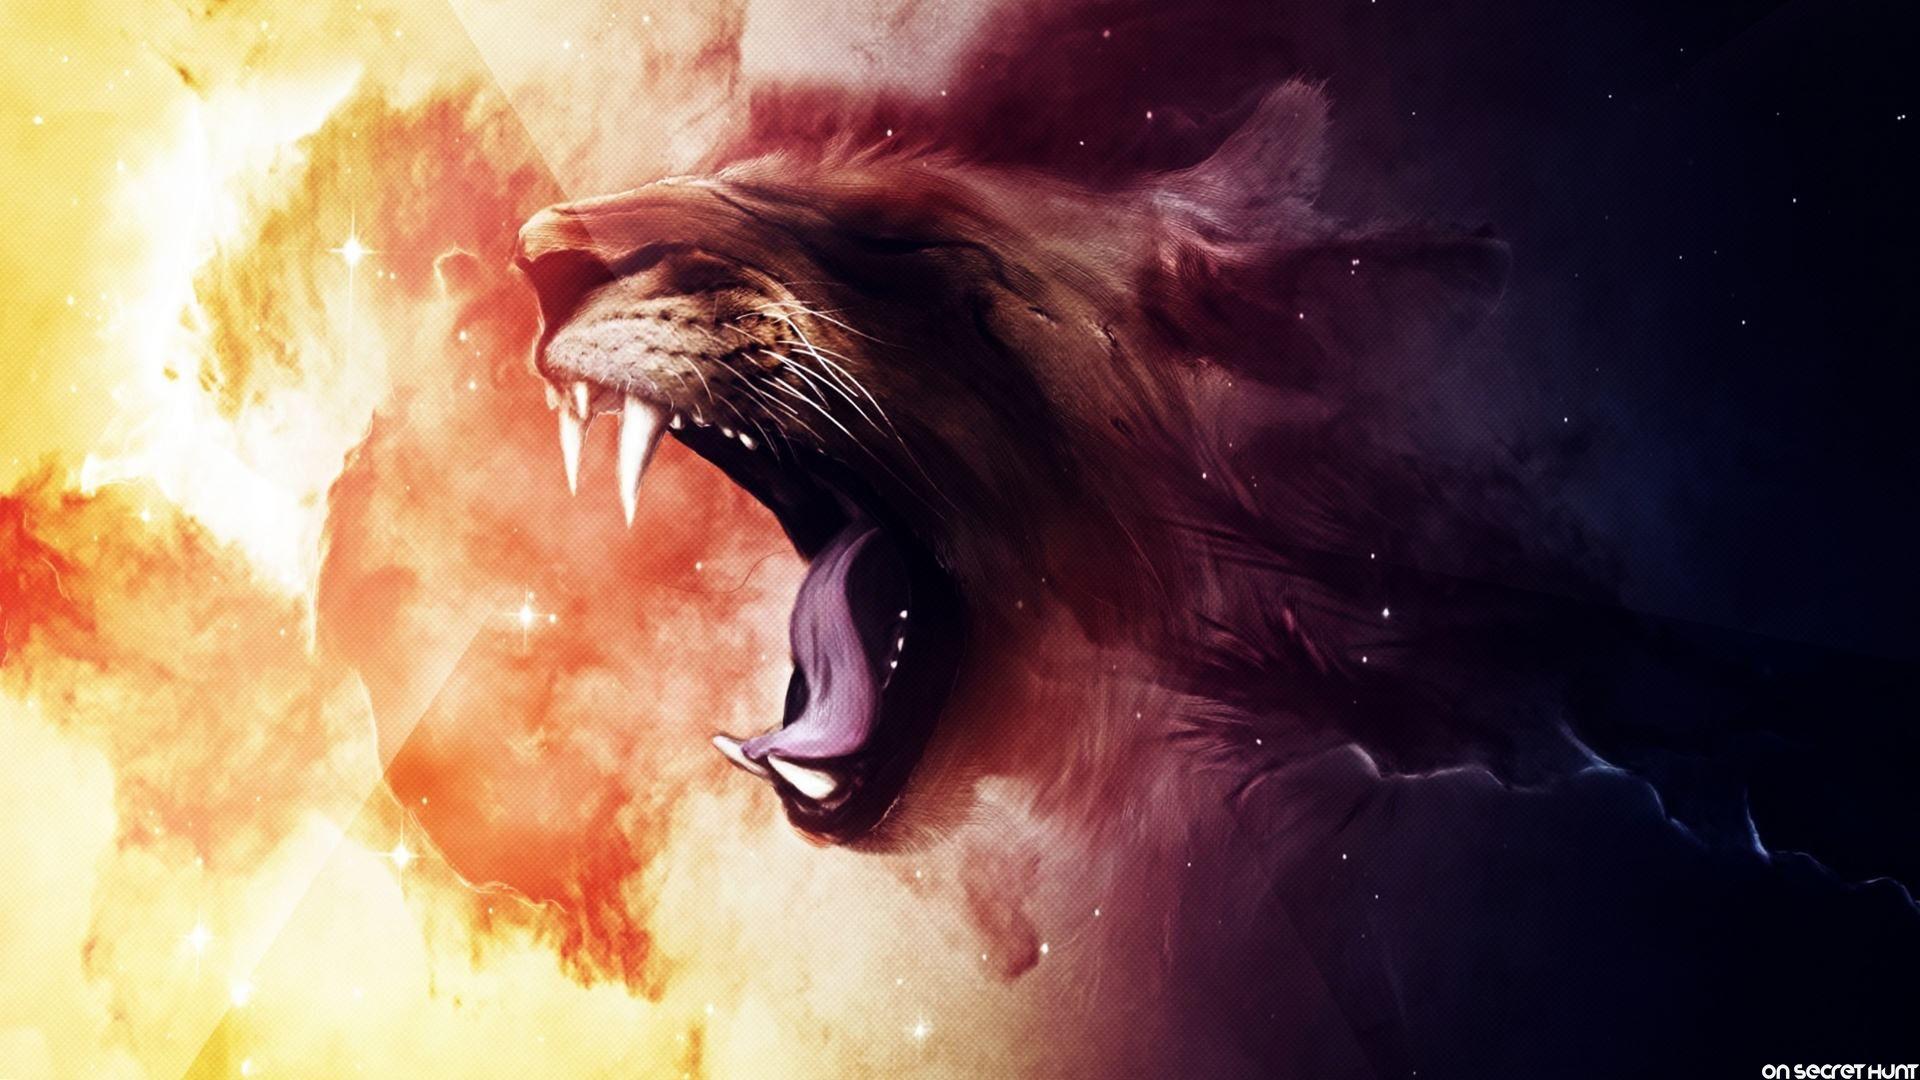 Roaring-Animated-Lion-Wallpaper